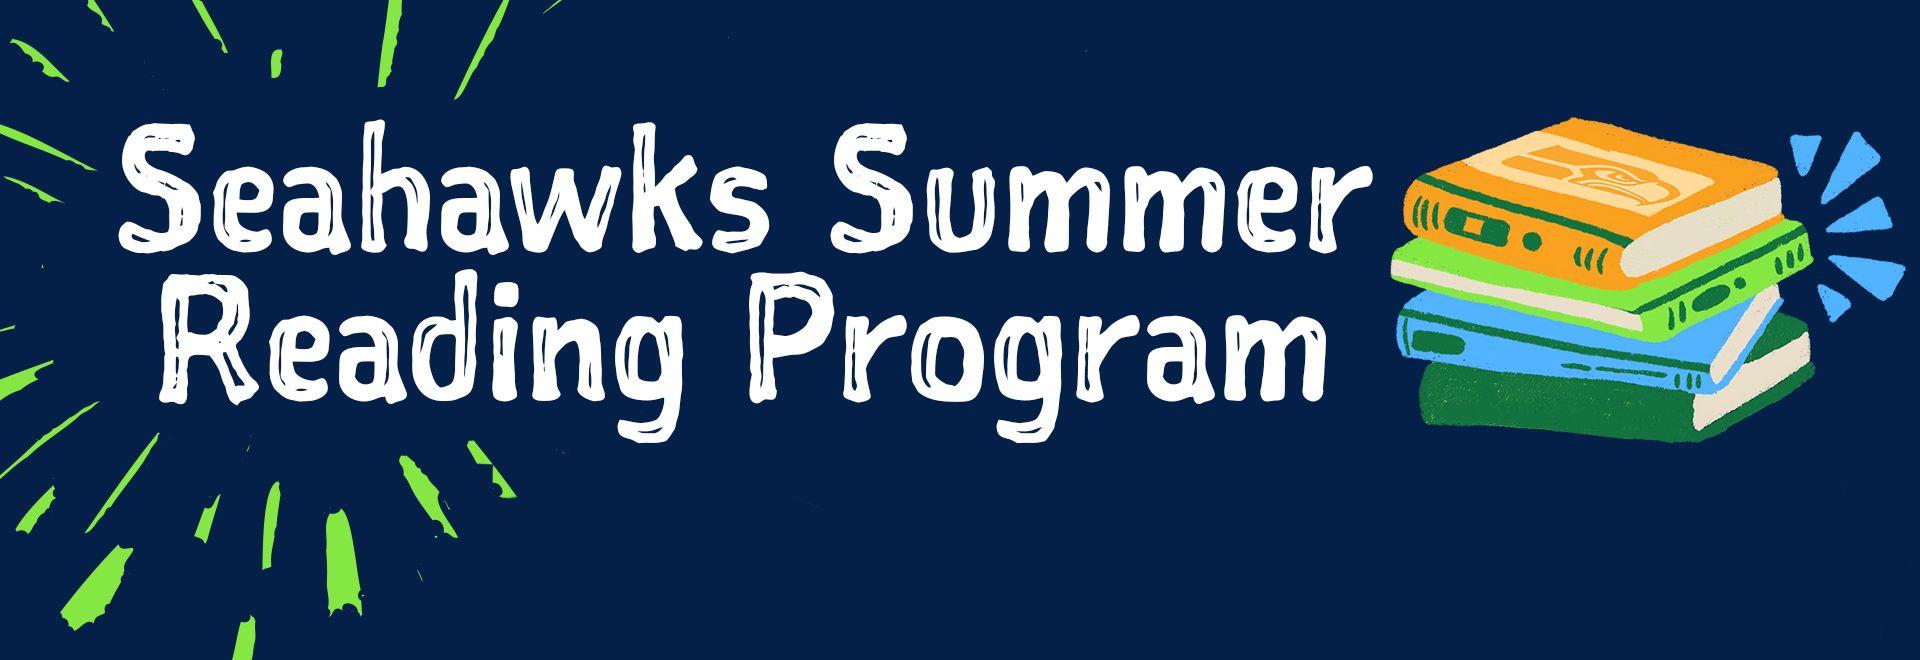 200804-summer-reading-program-generic-1920x660